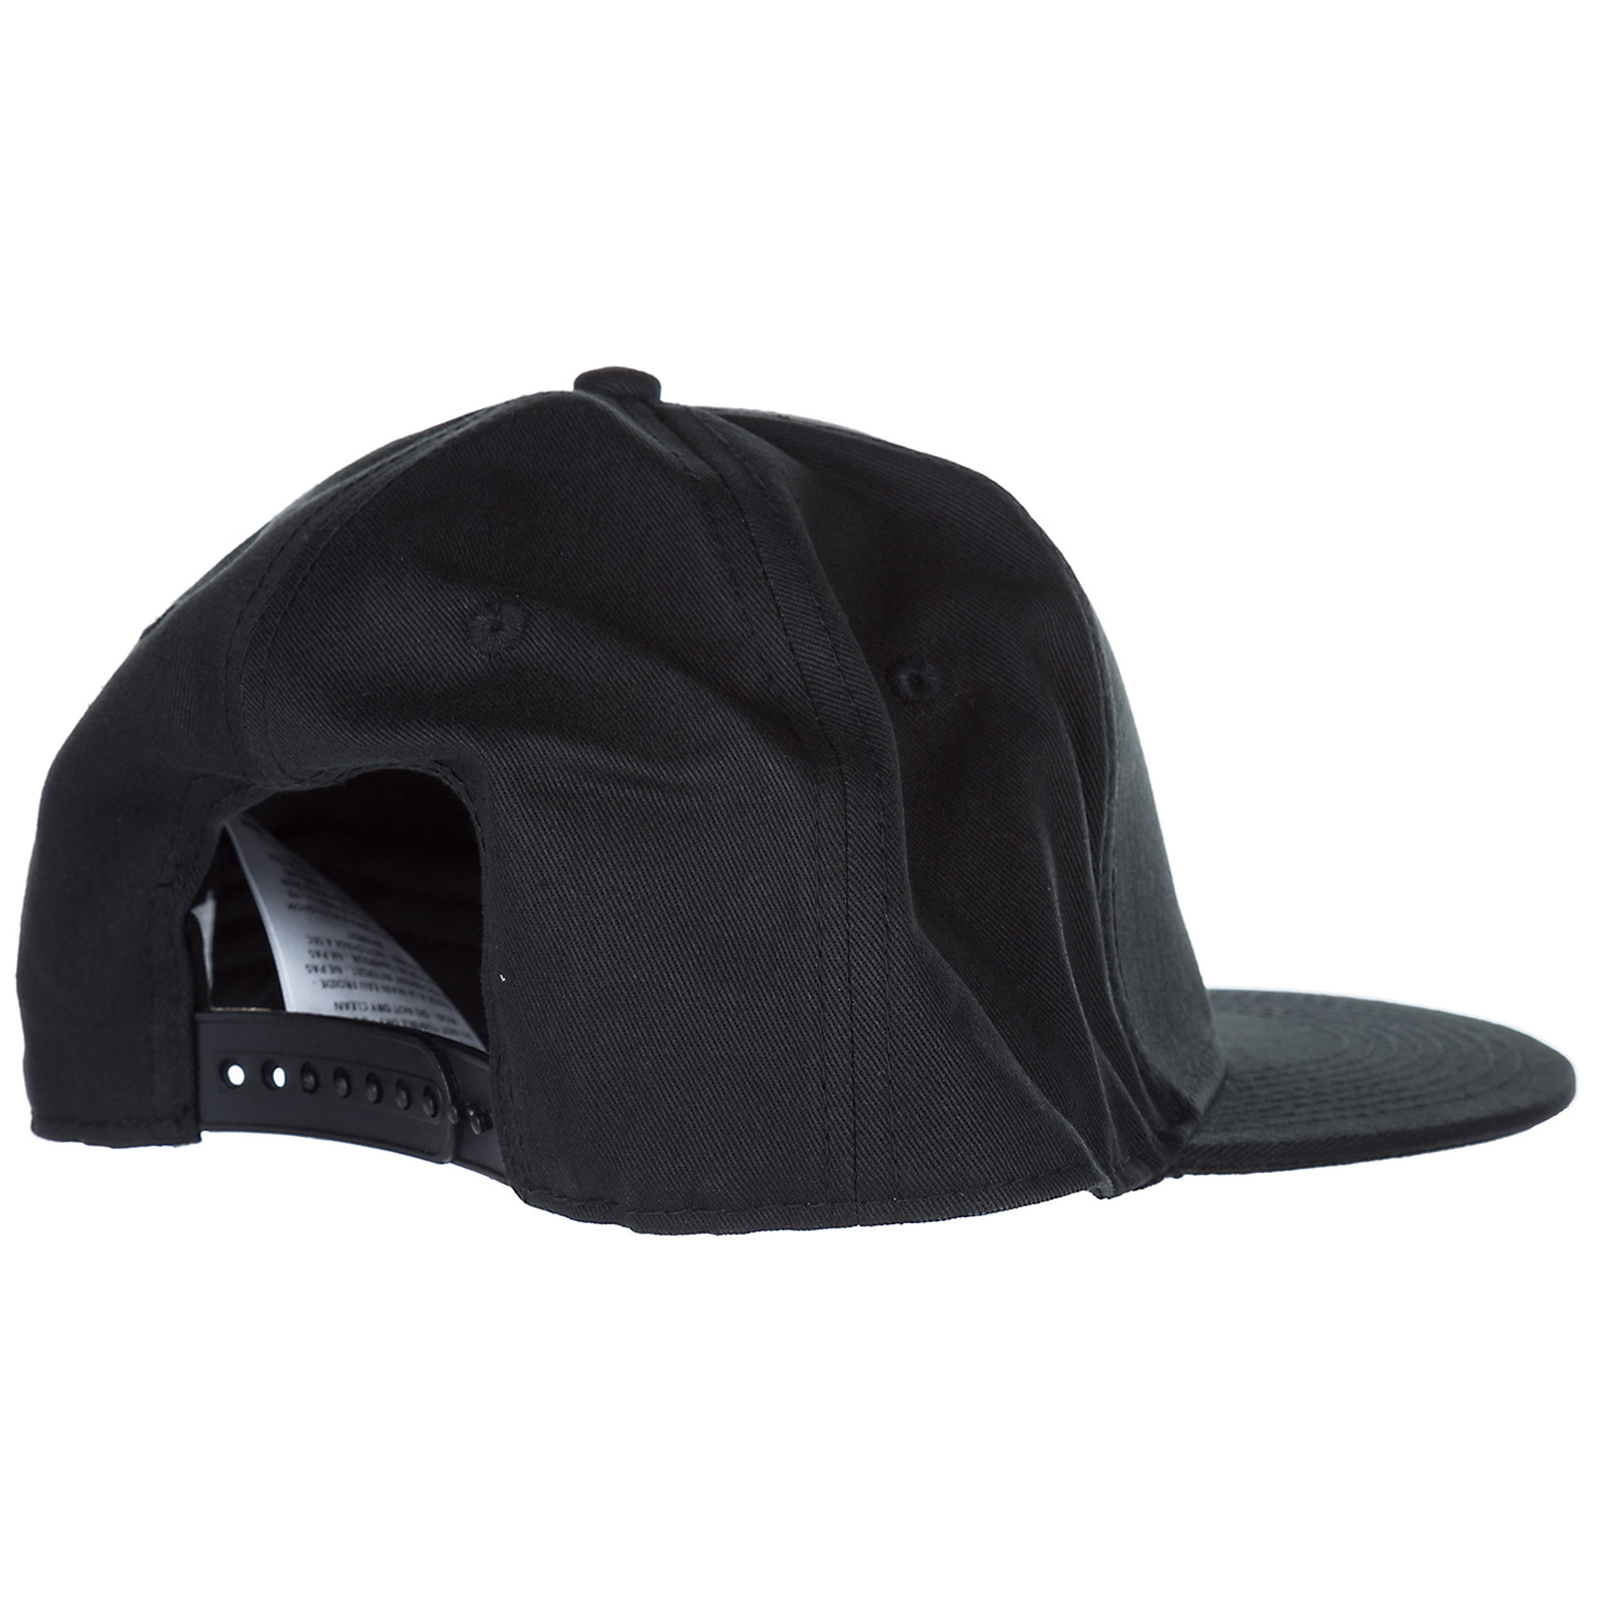 Adjustable men's cotton hat baseball cap  glifo